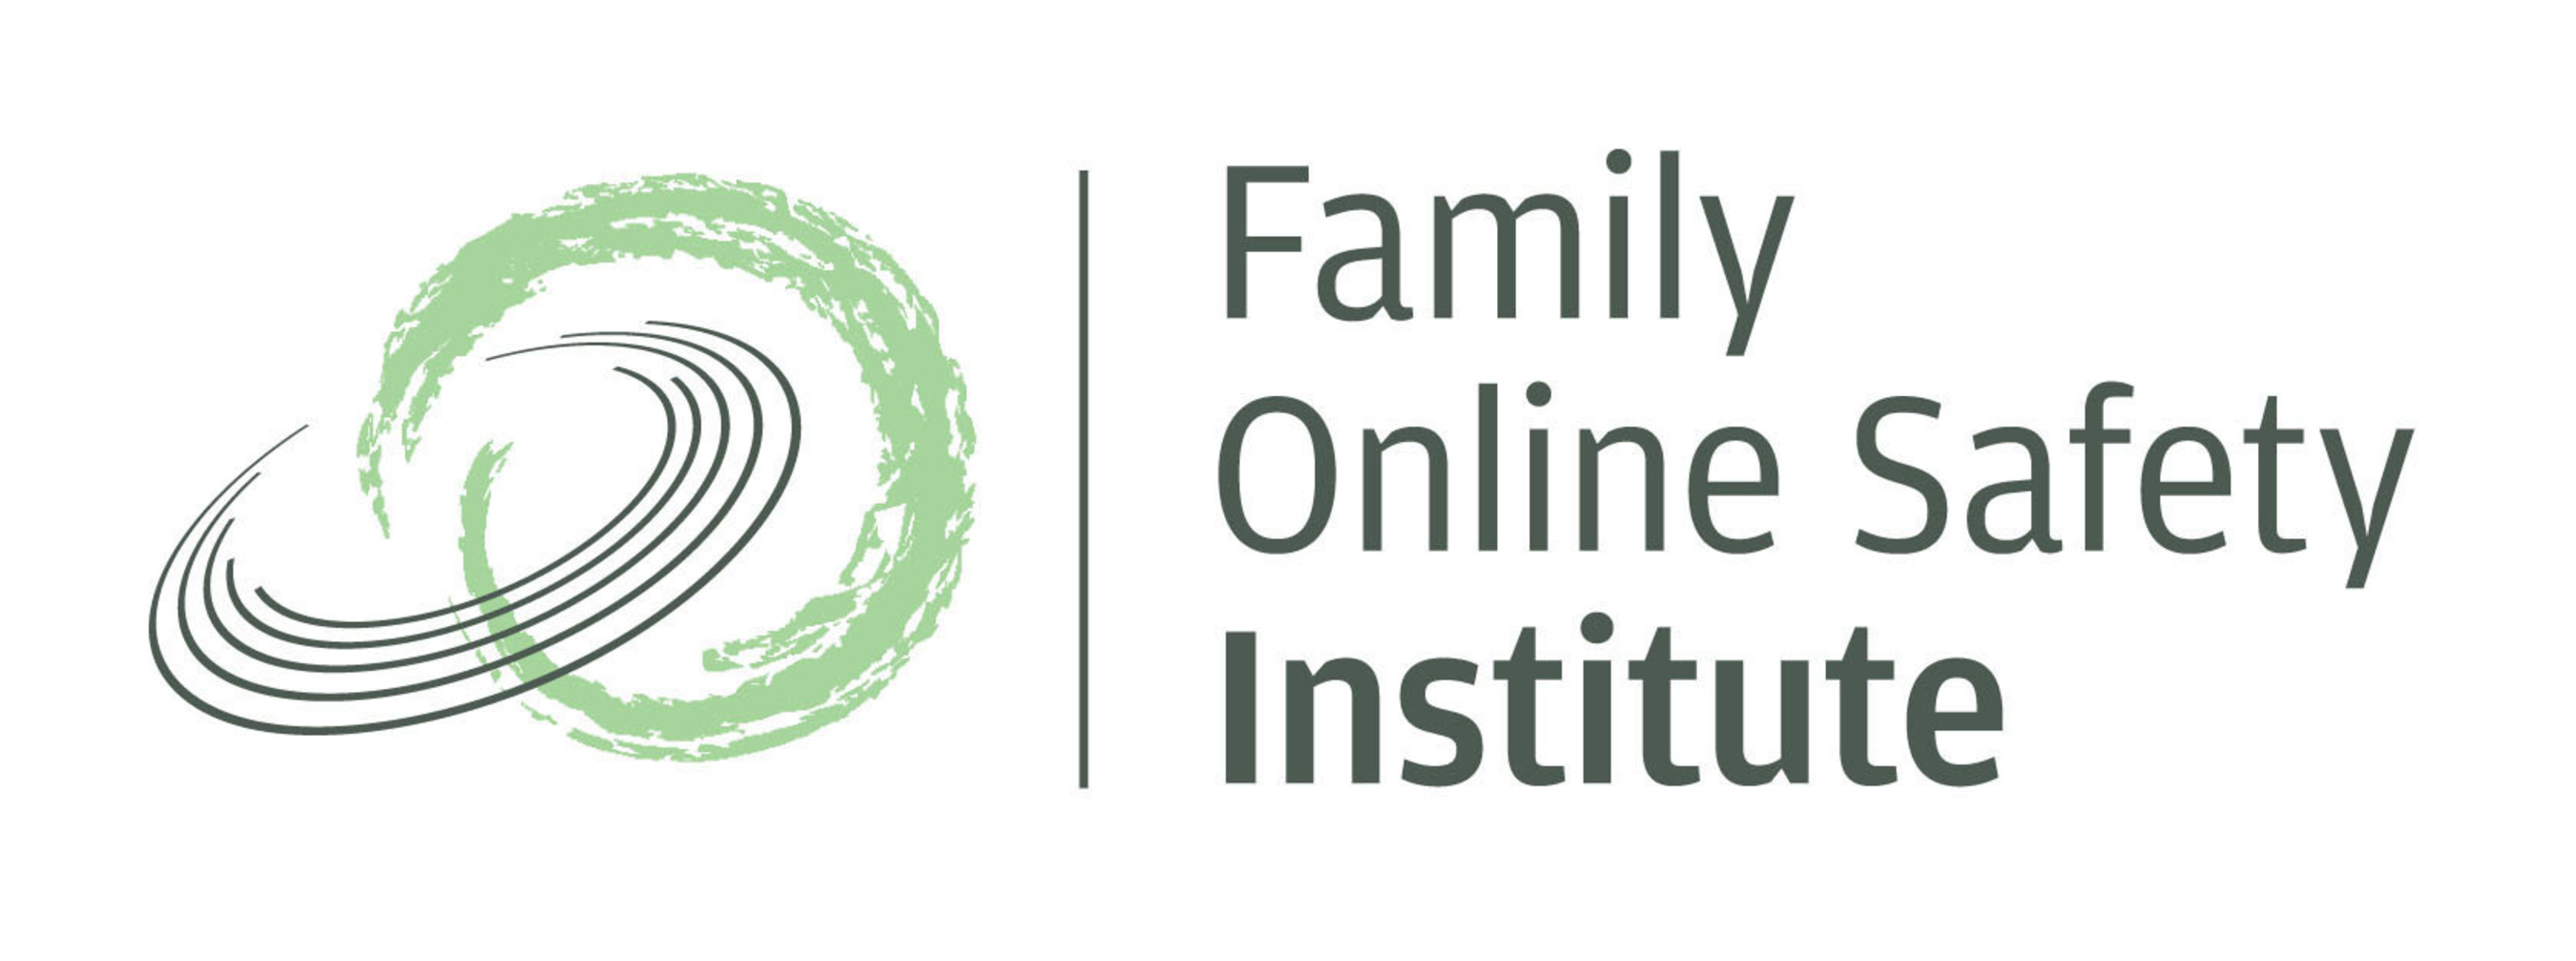 Family Online Safety Institute Logo.